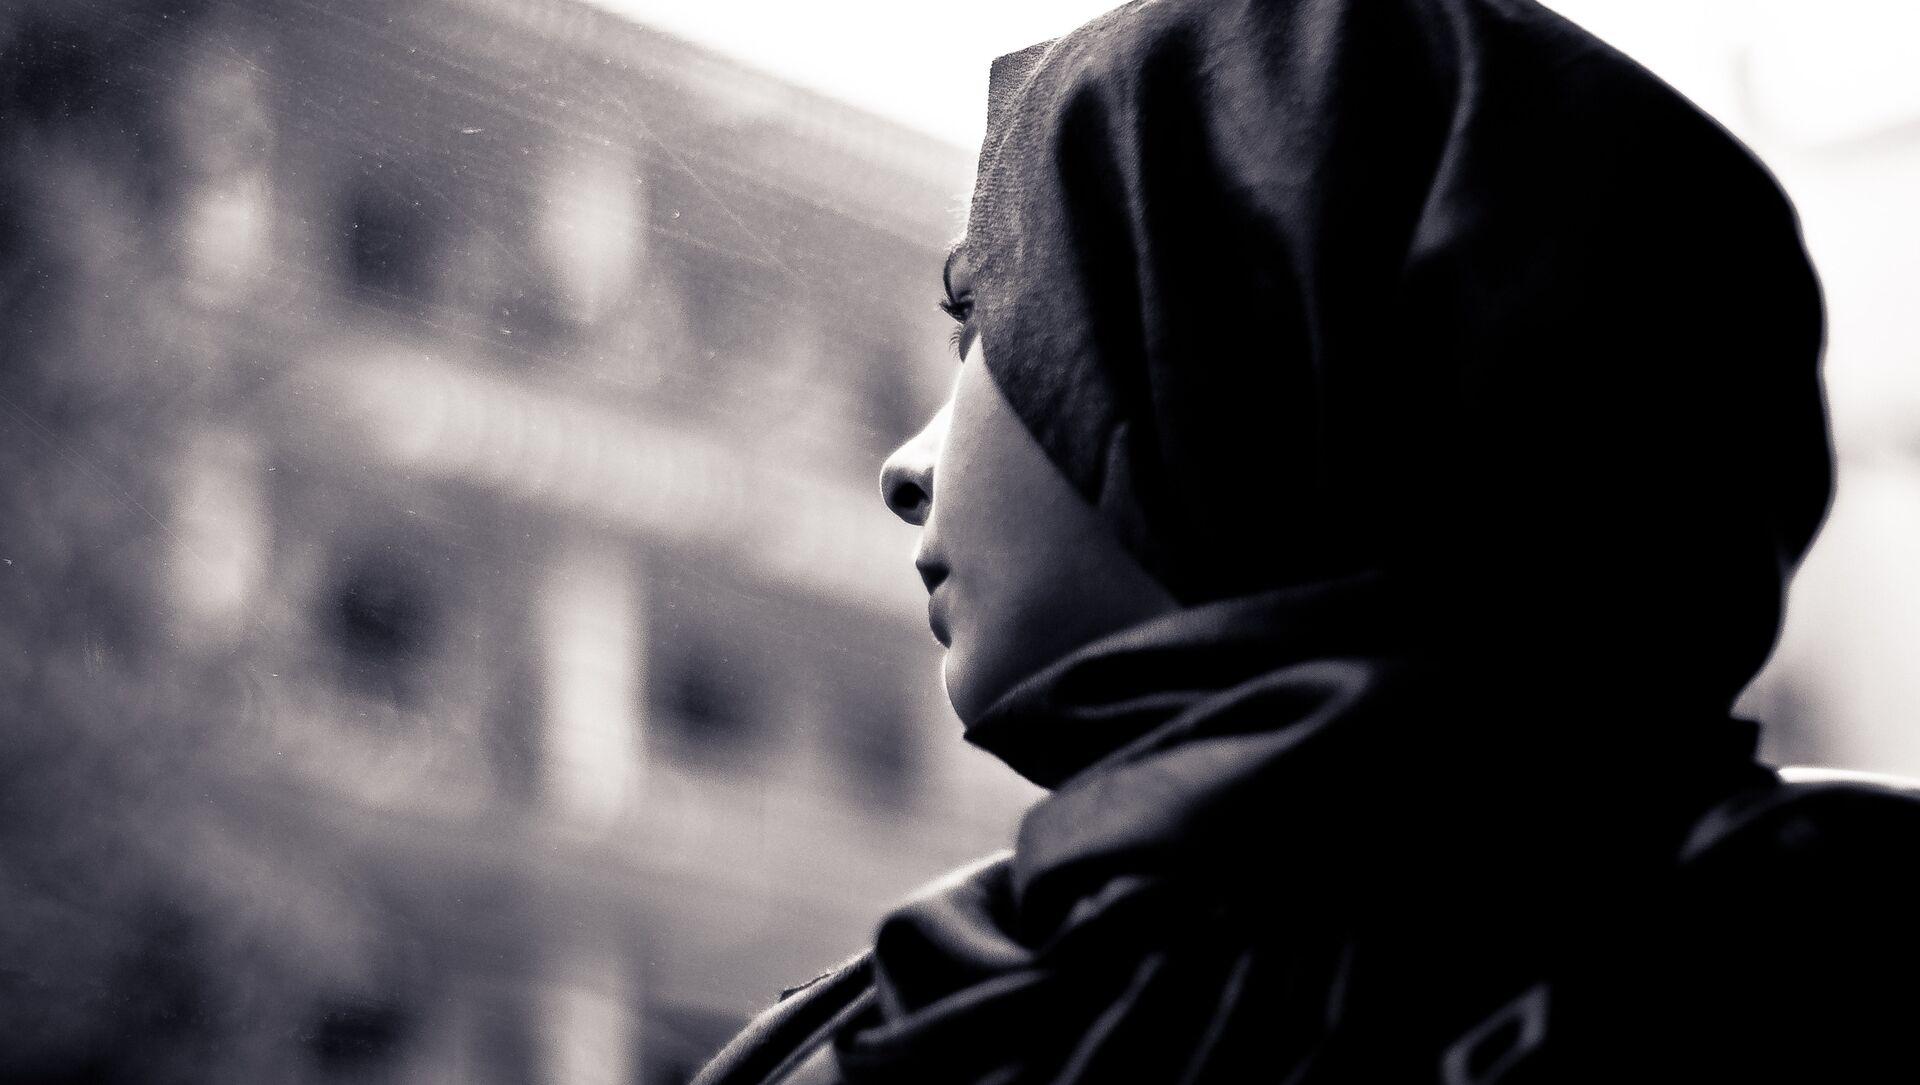 Una donna che indossa un hijab - Sputnik Italia, 1920, 11.04.2021